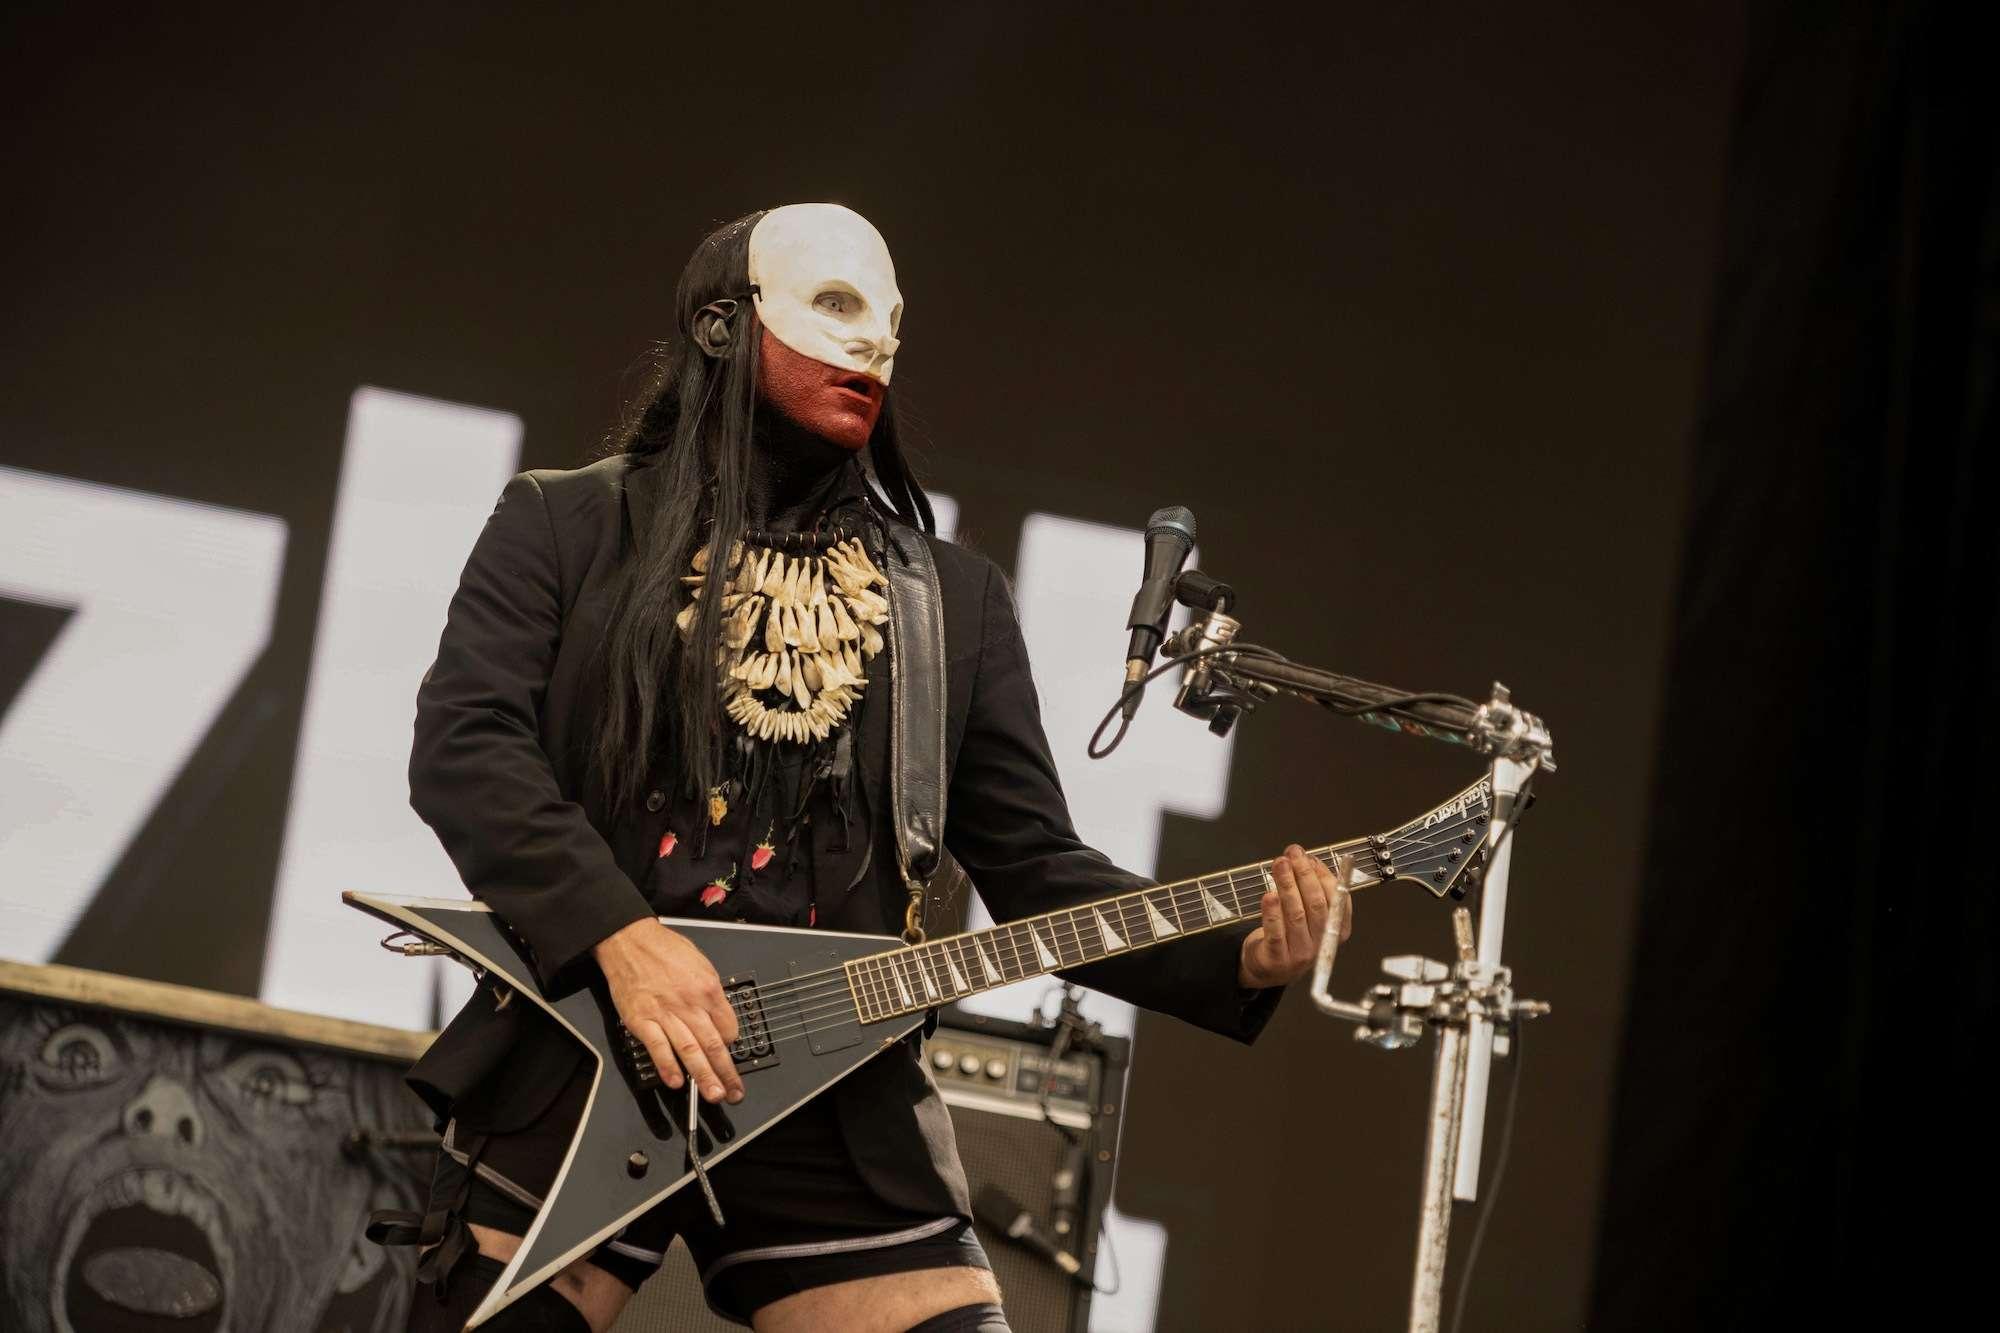 Limp Bizkit Live at Lollapalooza [GALLERY] 26